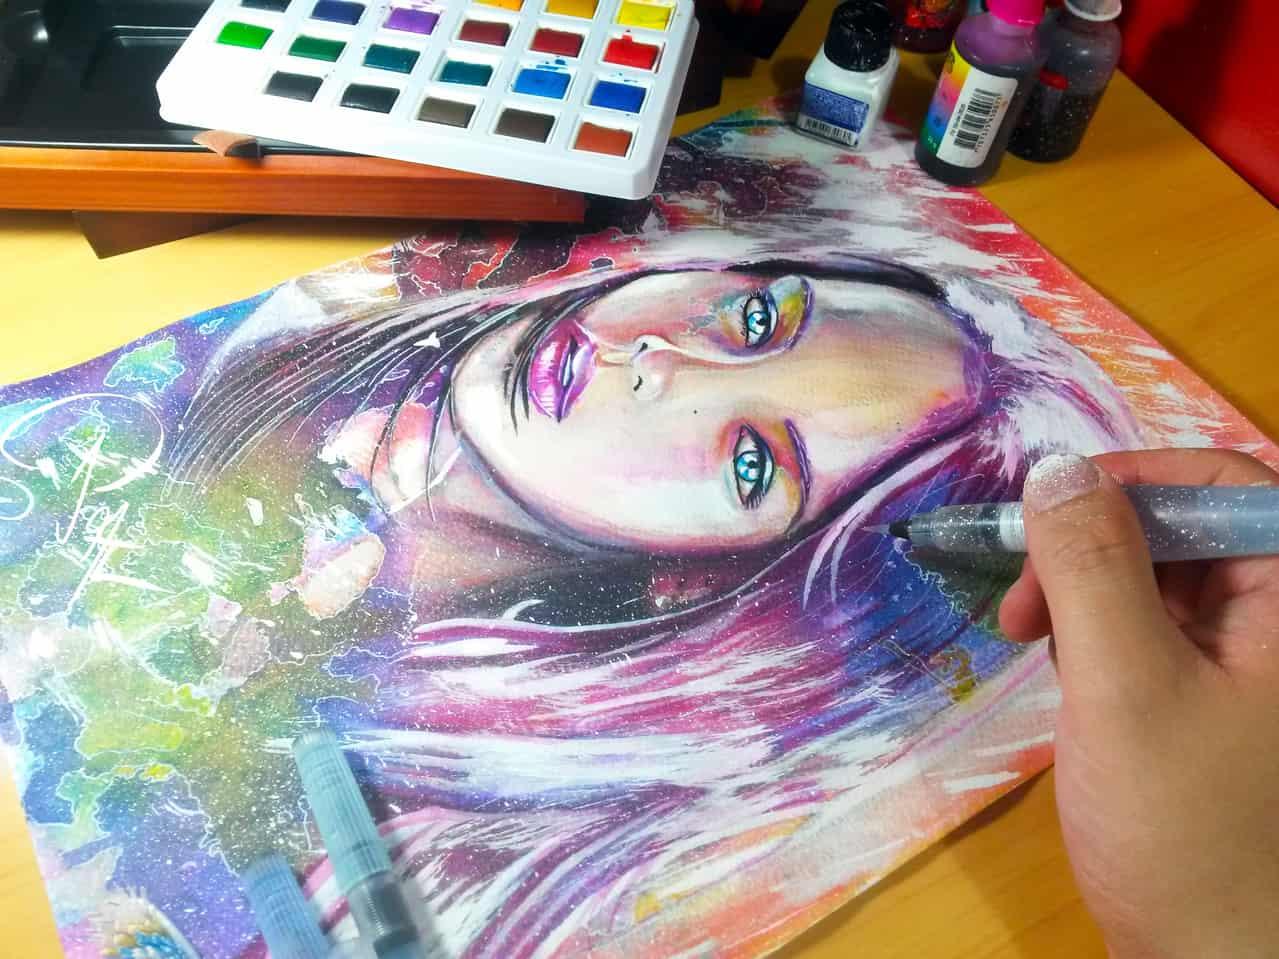 Violeta Illust of Jonathan Prada Castaño ARTstreet_Ranking April.2020Contest:Color watercolor painting face art drawing girl beautiful woman